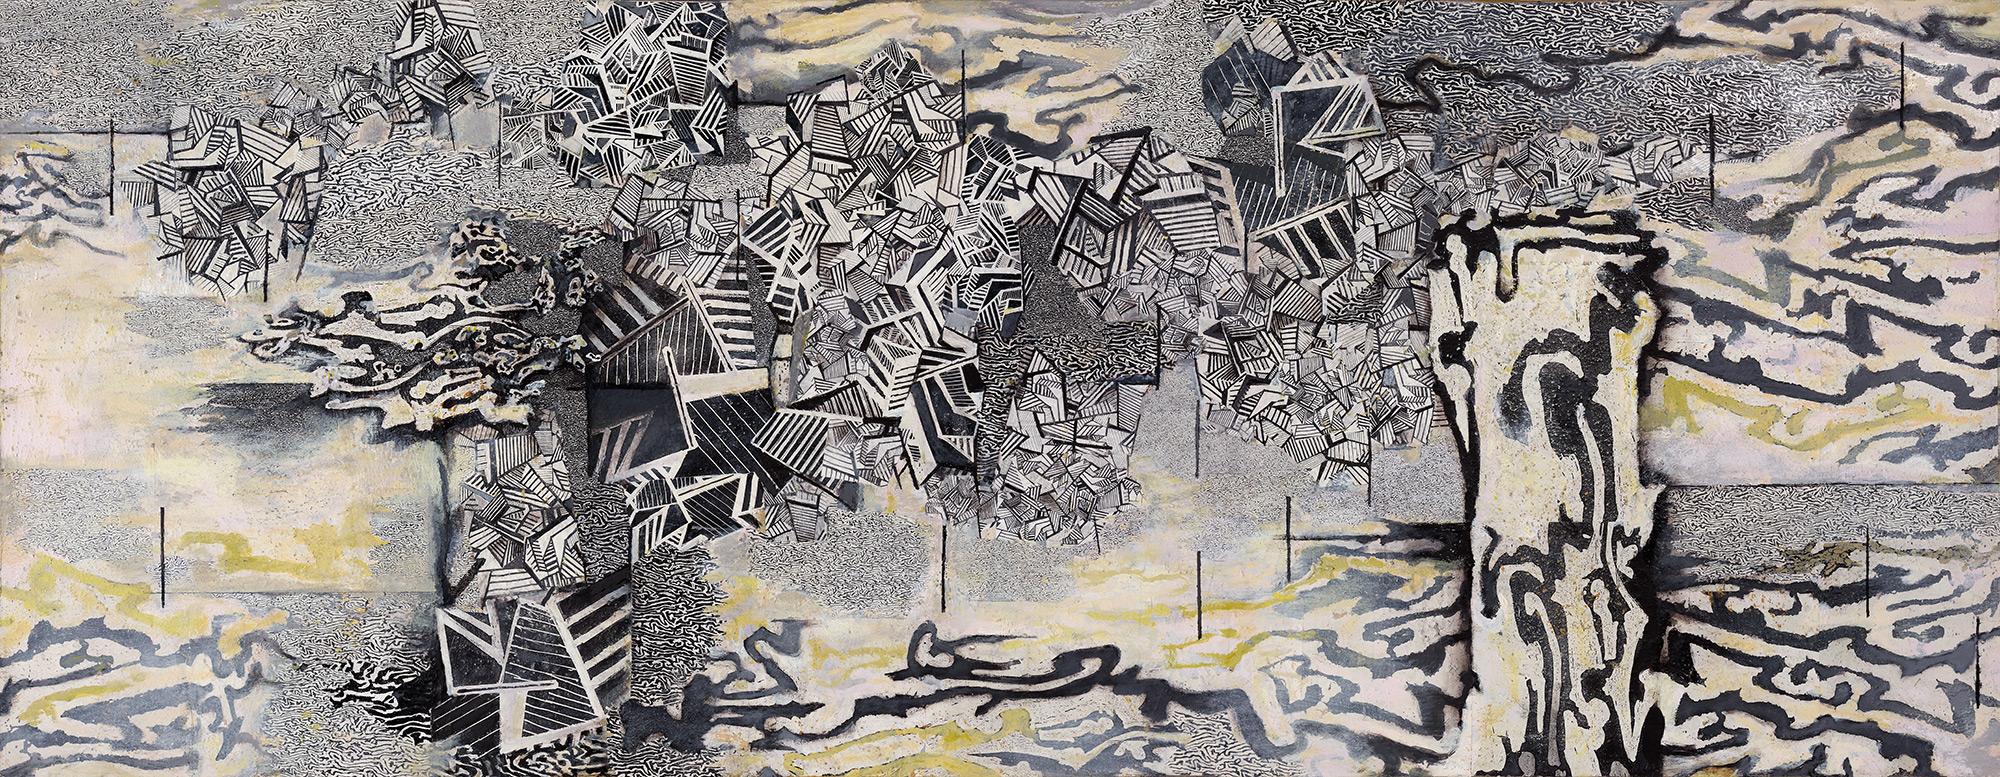 Urban Flood  2003-14, 119 x 305 cm